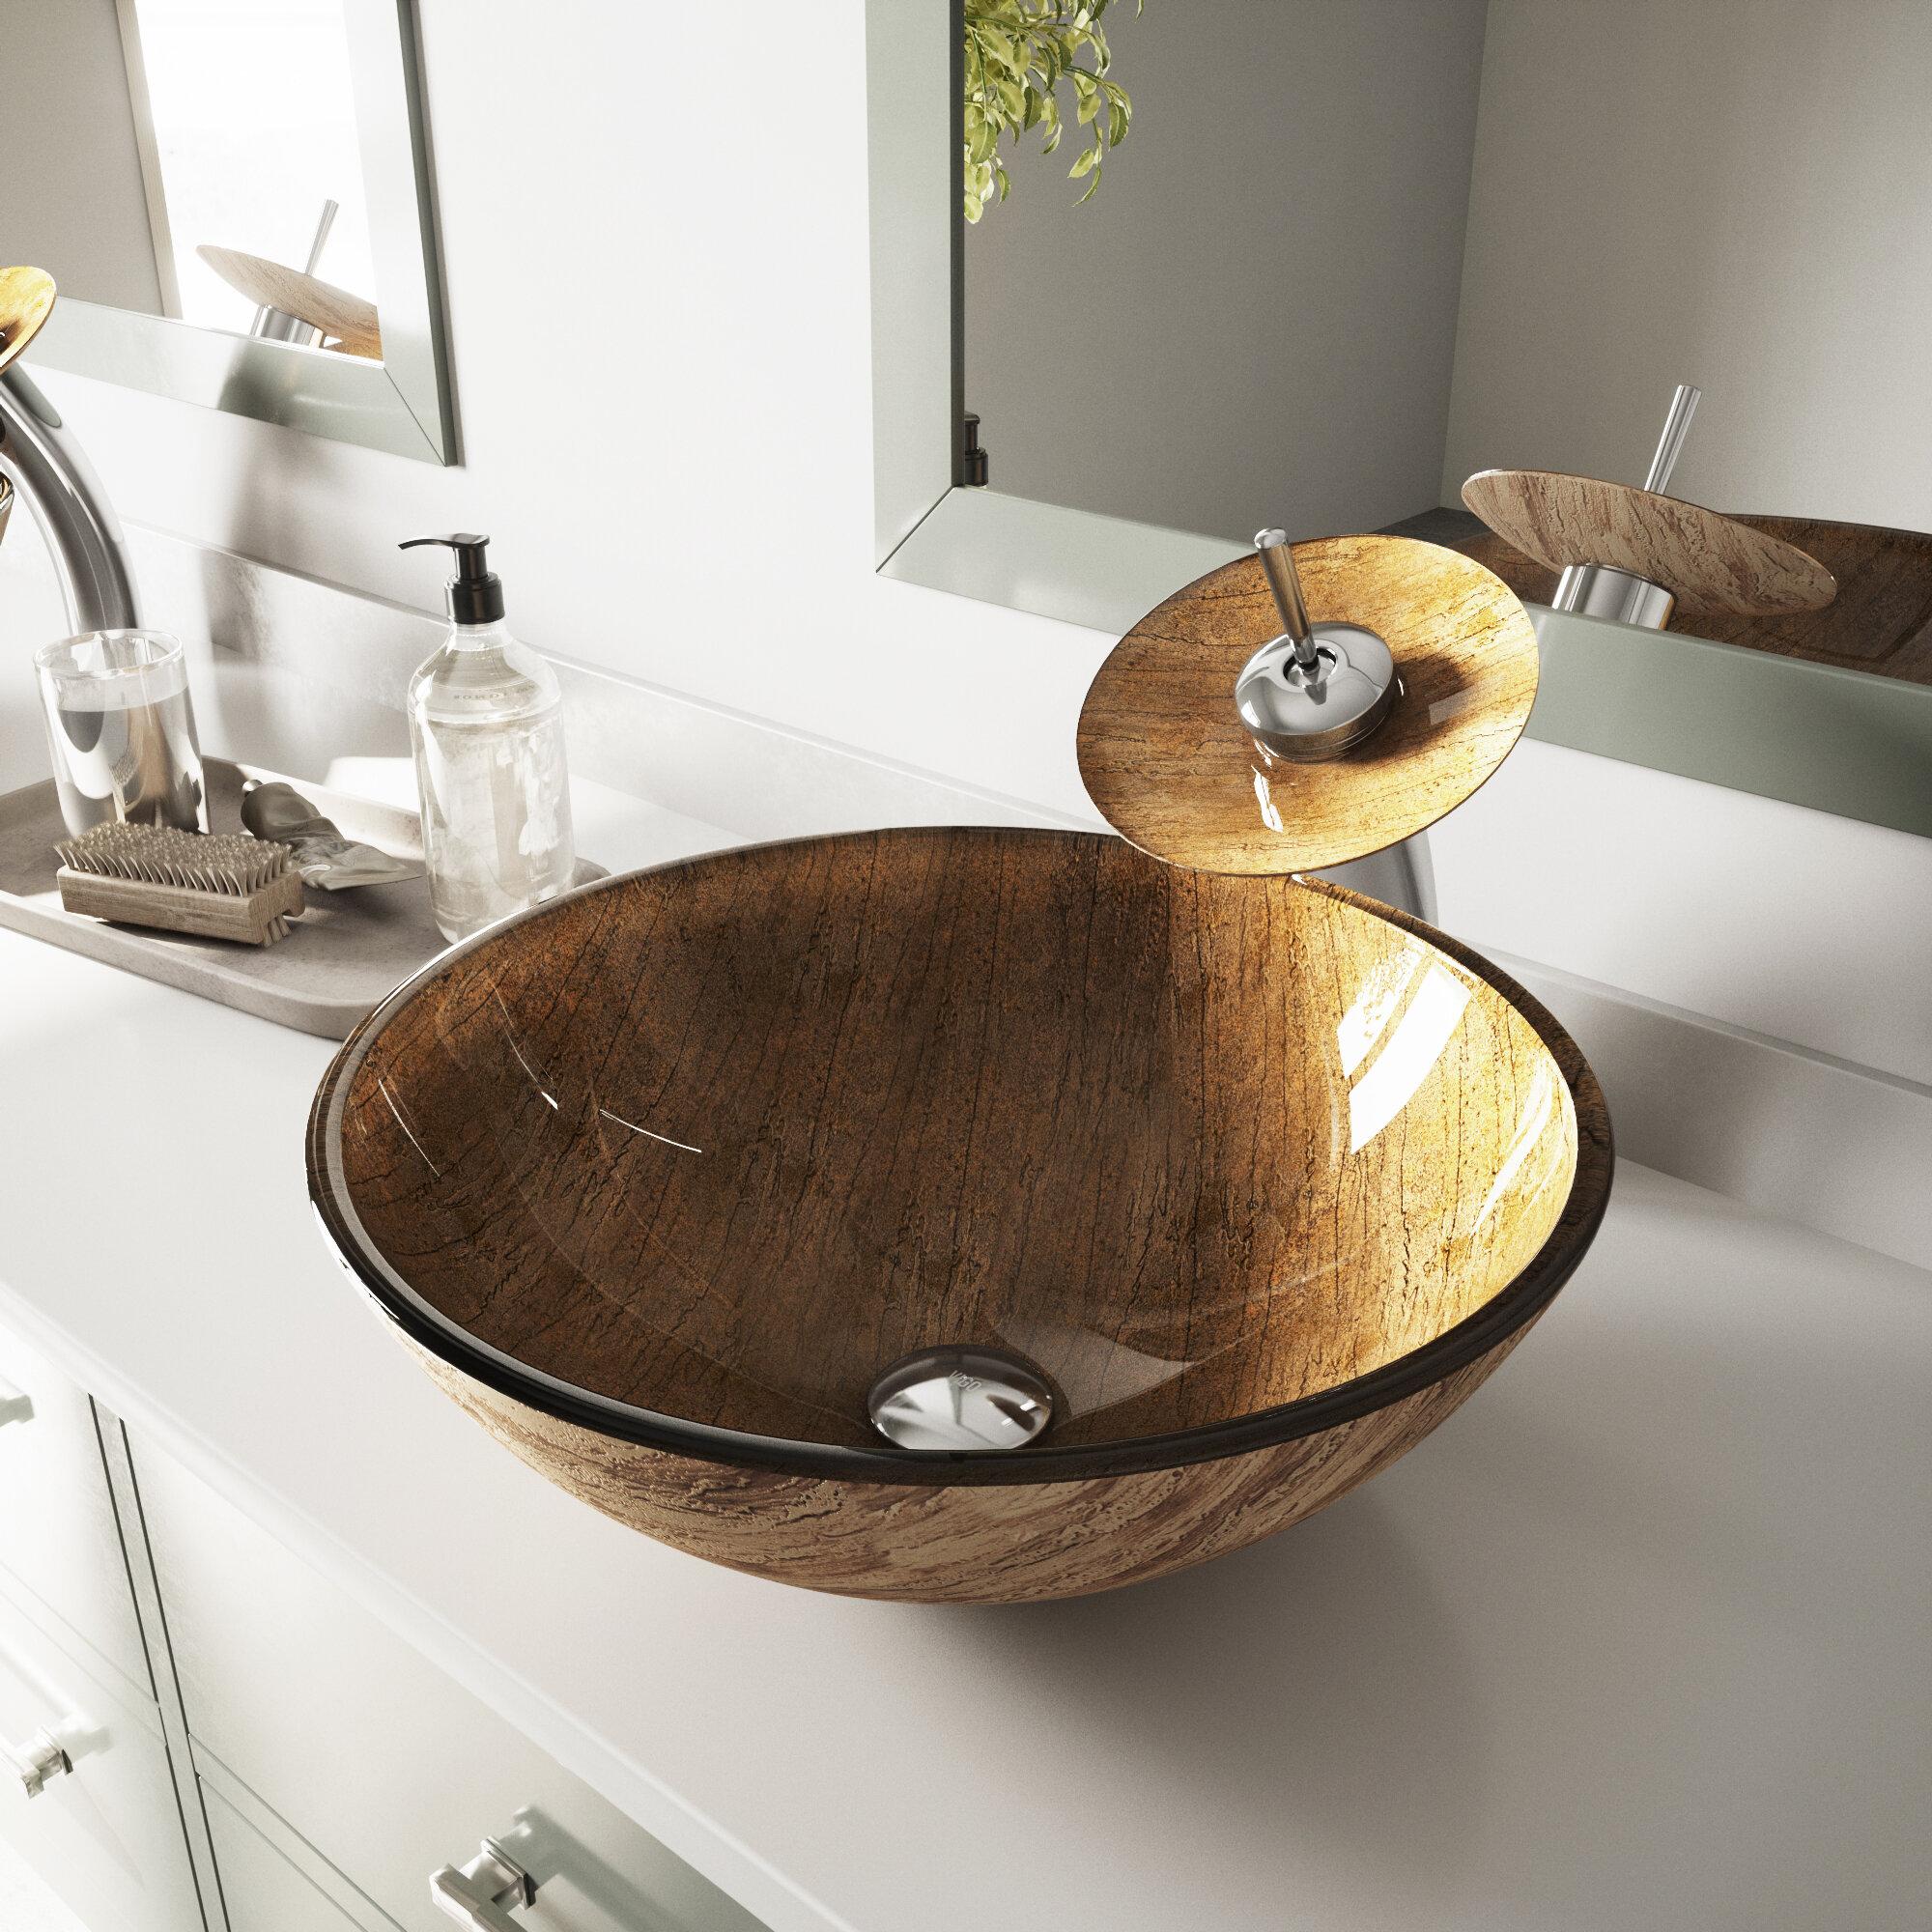 Vigo Brown Tempered Glass Handmade Circular Vessel Bathroom Sink Reviews Wayfair